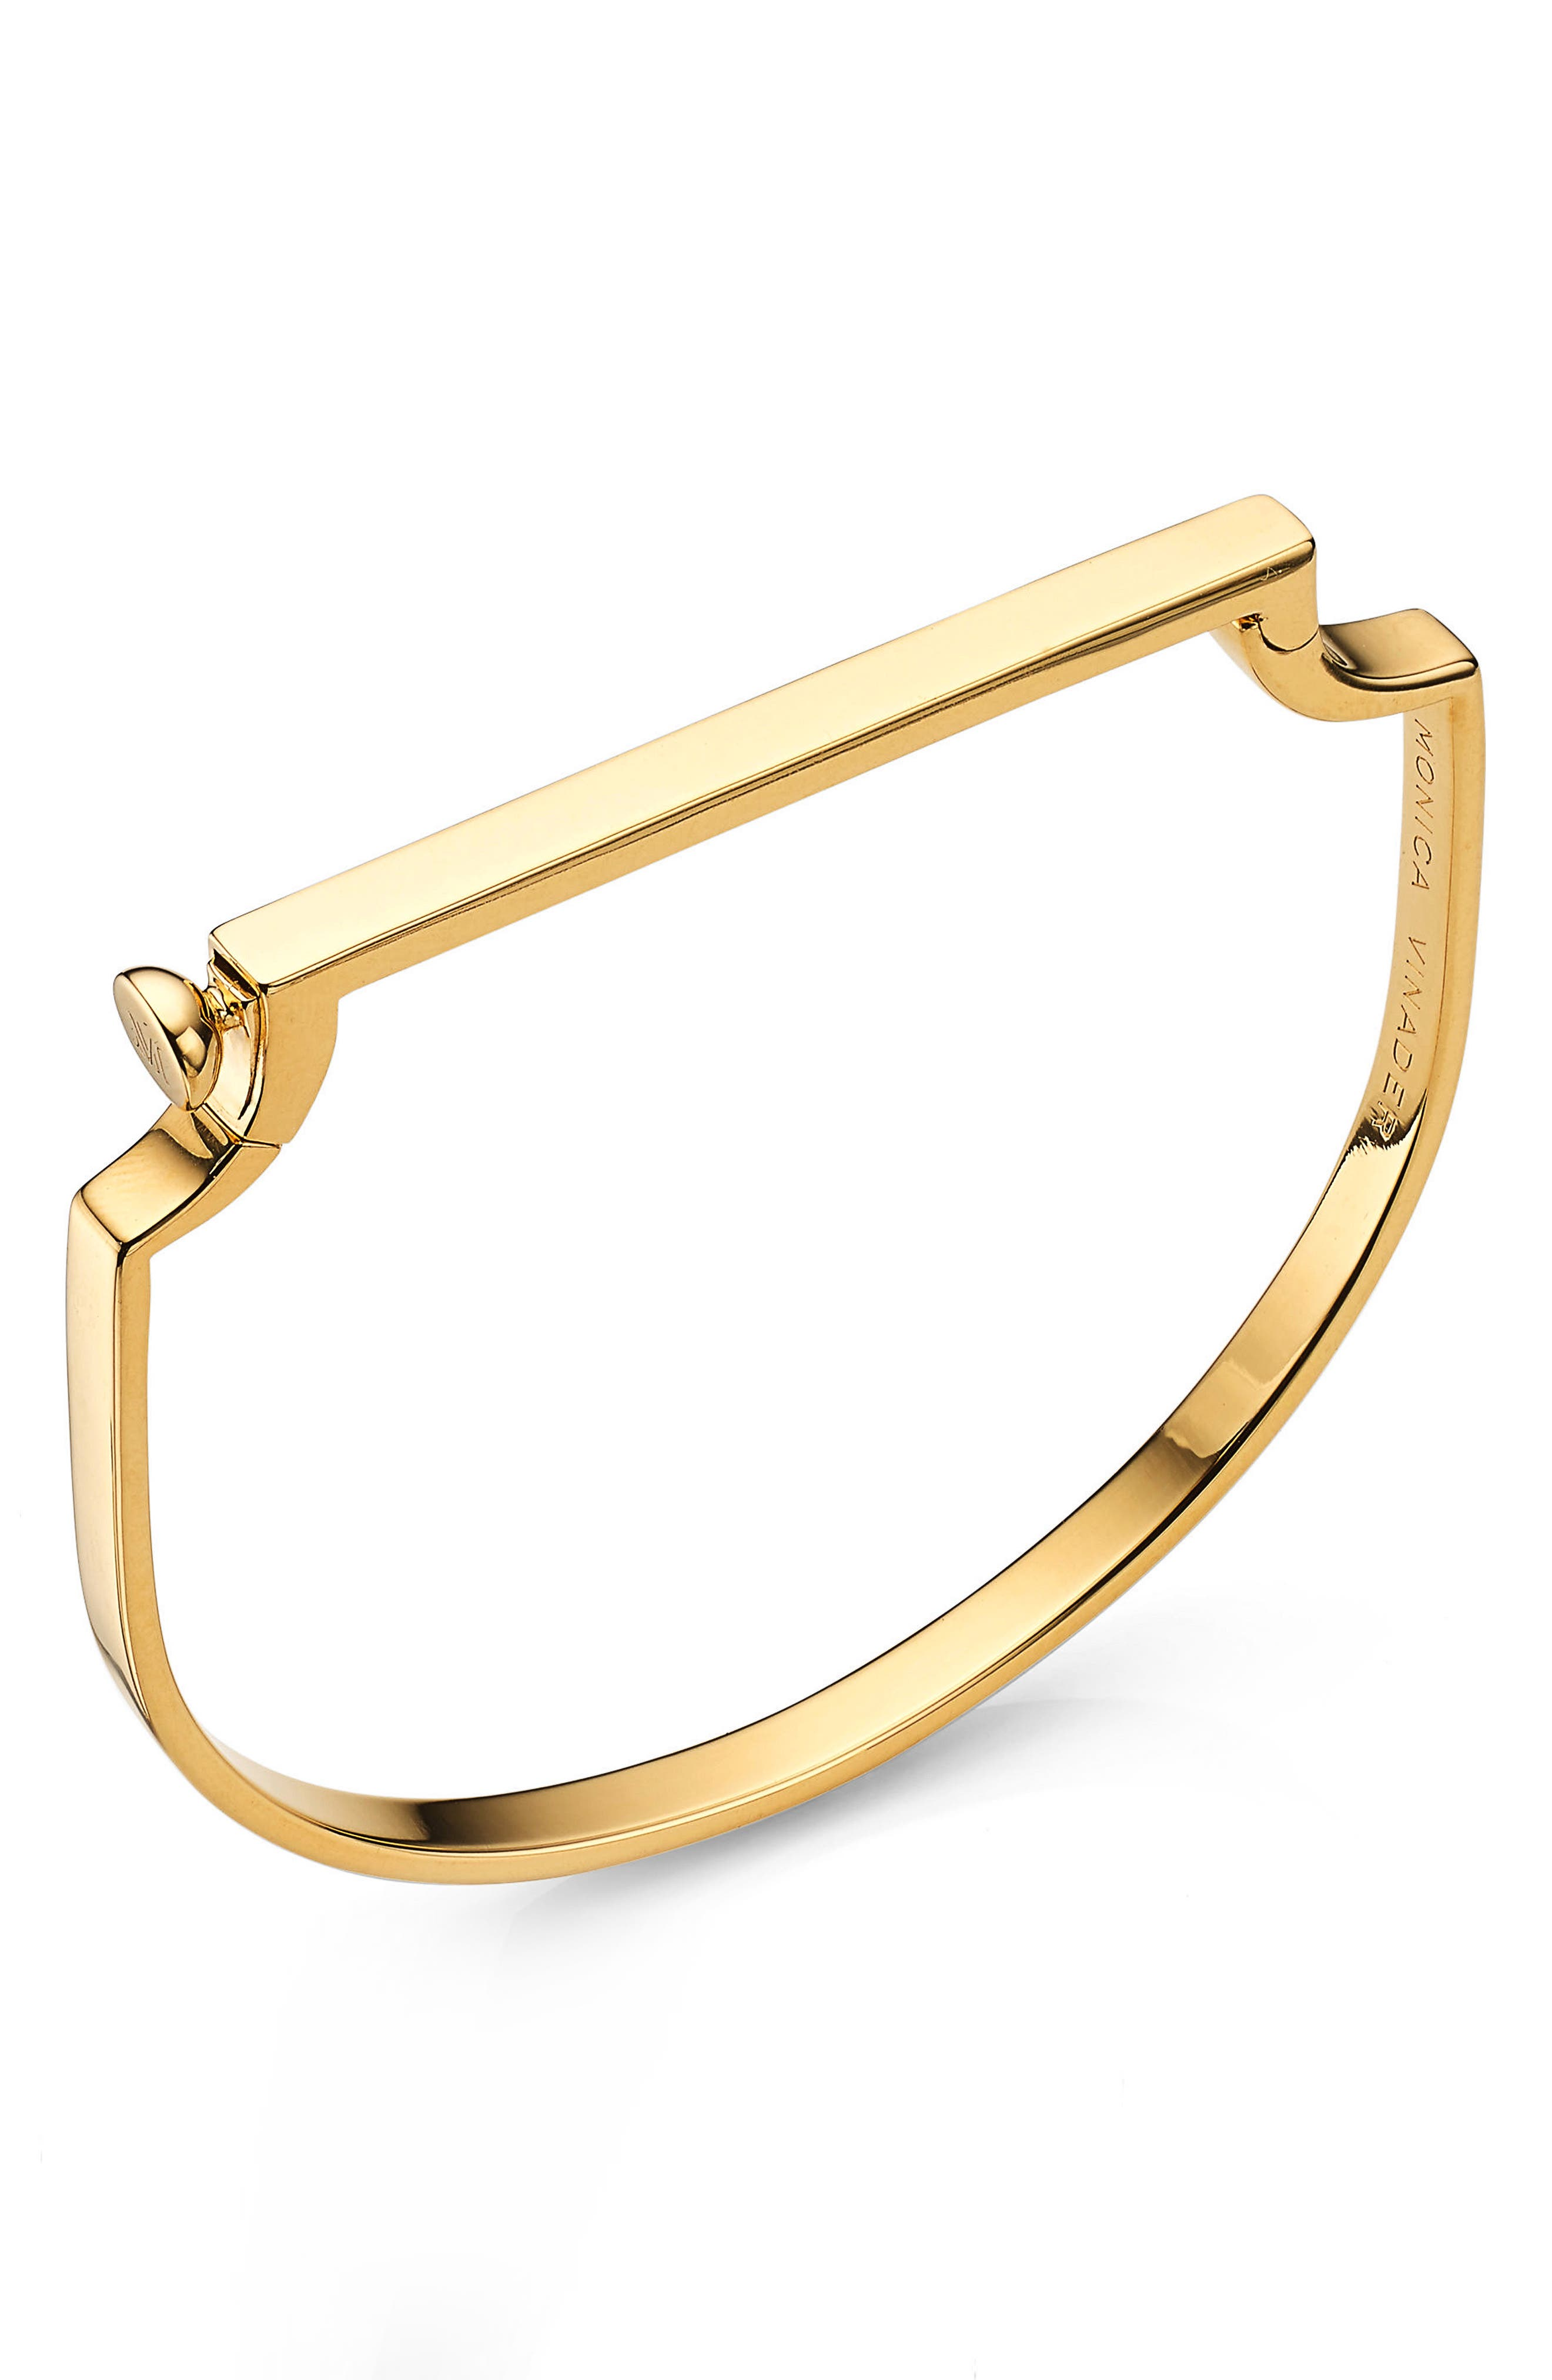 Signature Thin Bangle Bracelet,                             Main thumbnail 1, color,                             Yellow Gold